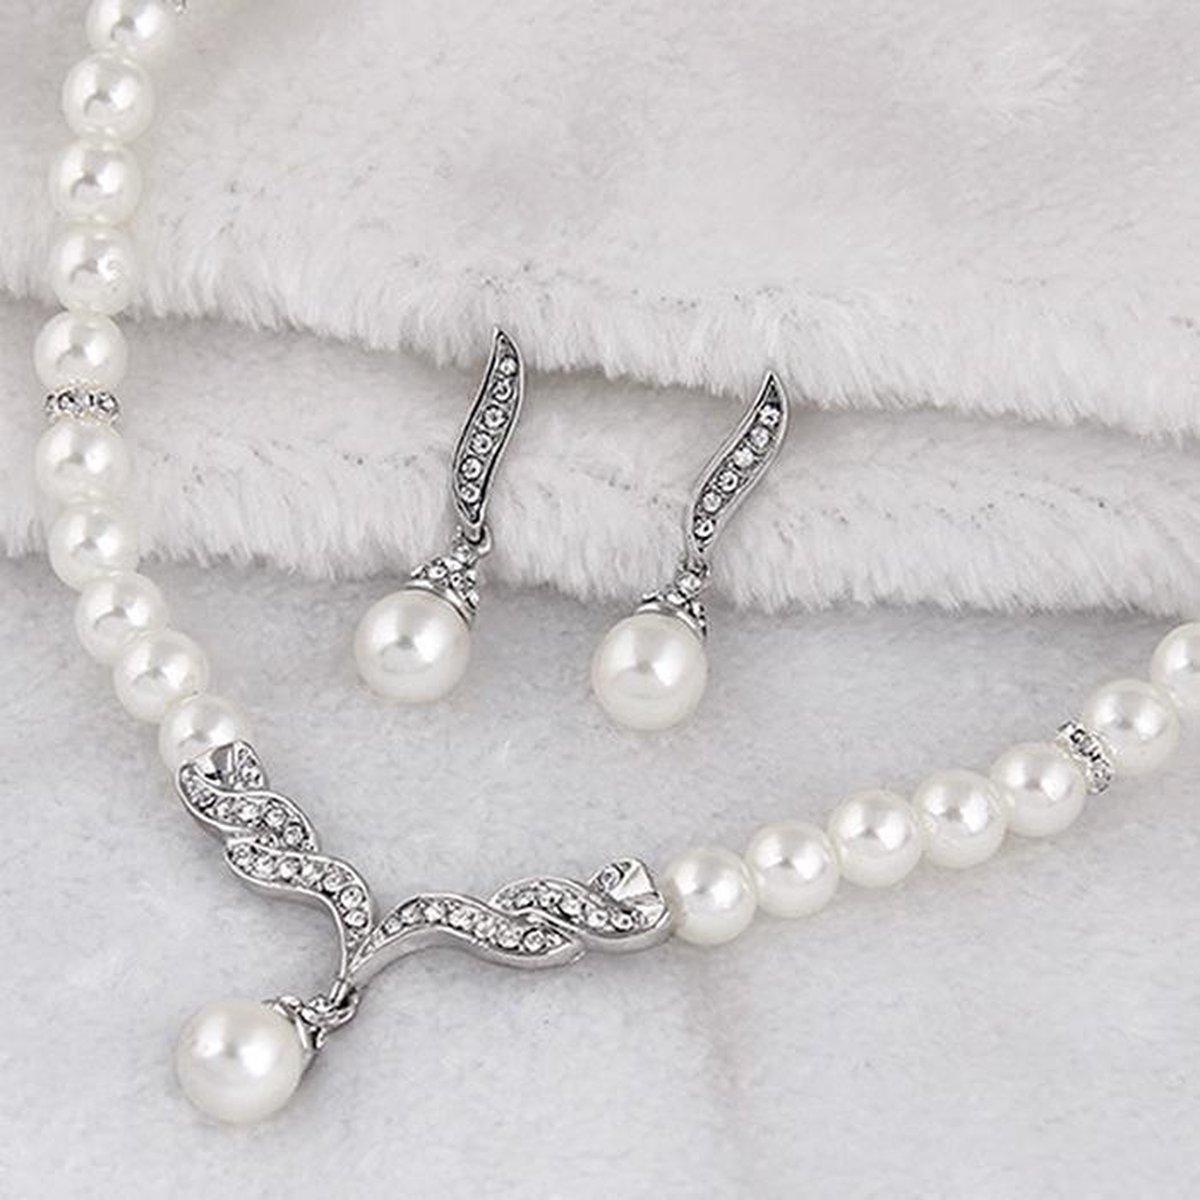 Fashionidea – Luxueuze zilverkleurige ketting met witte parels, glimmende zirkonias en bijpassende oorbellen - fashionvibe.nl